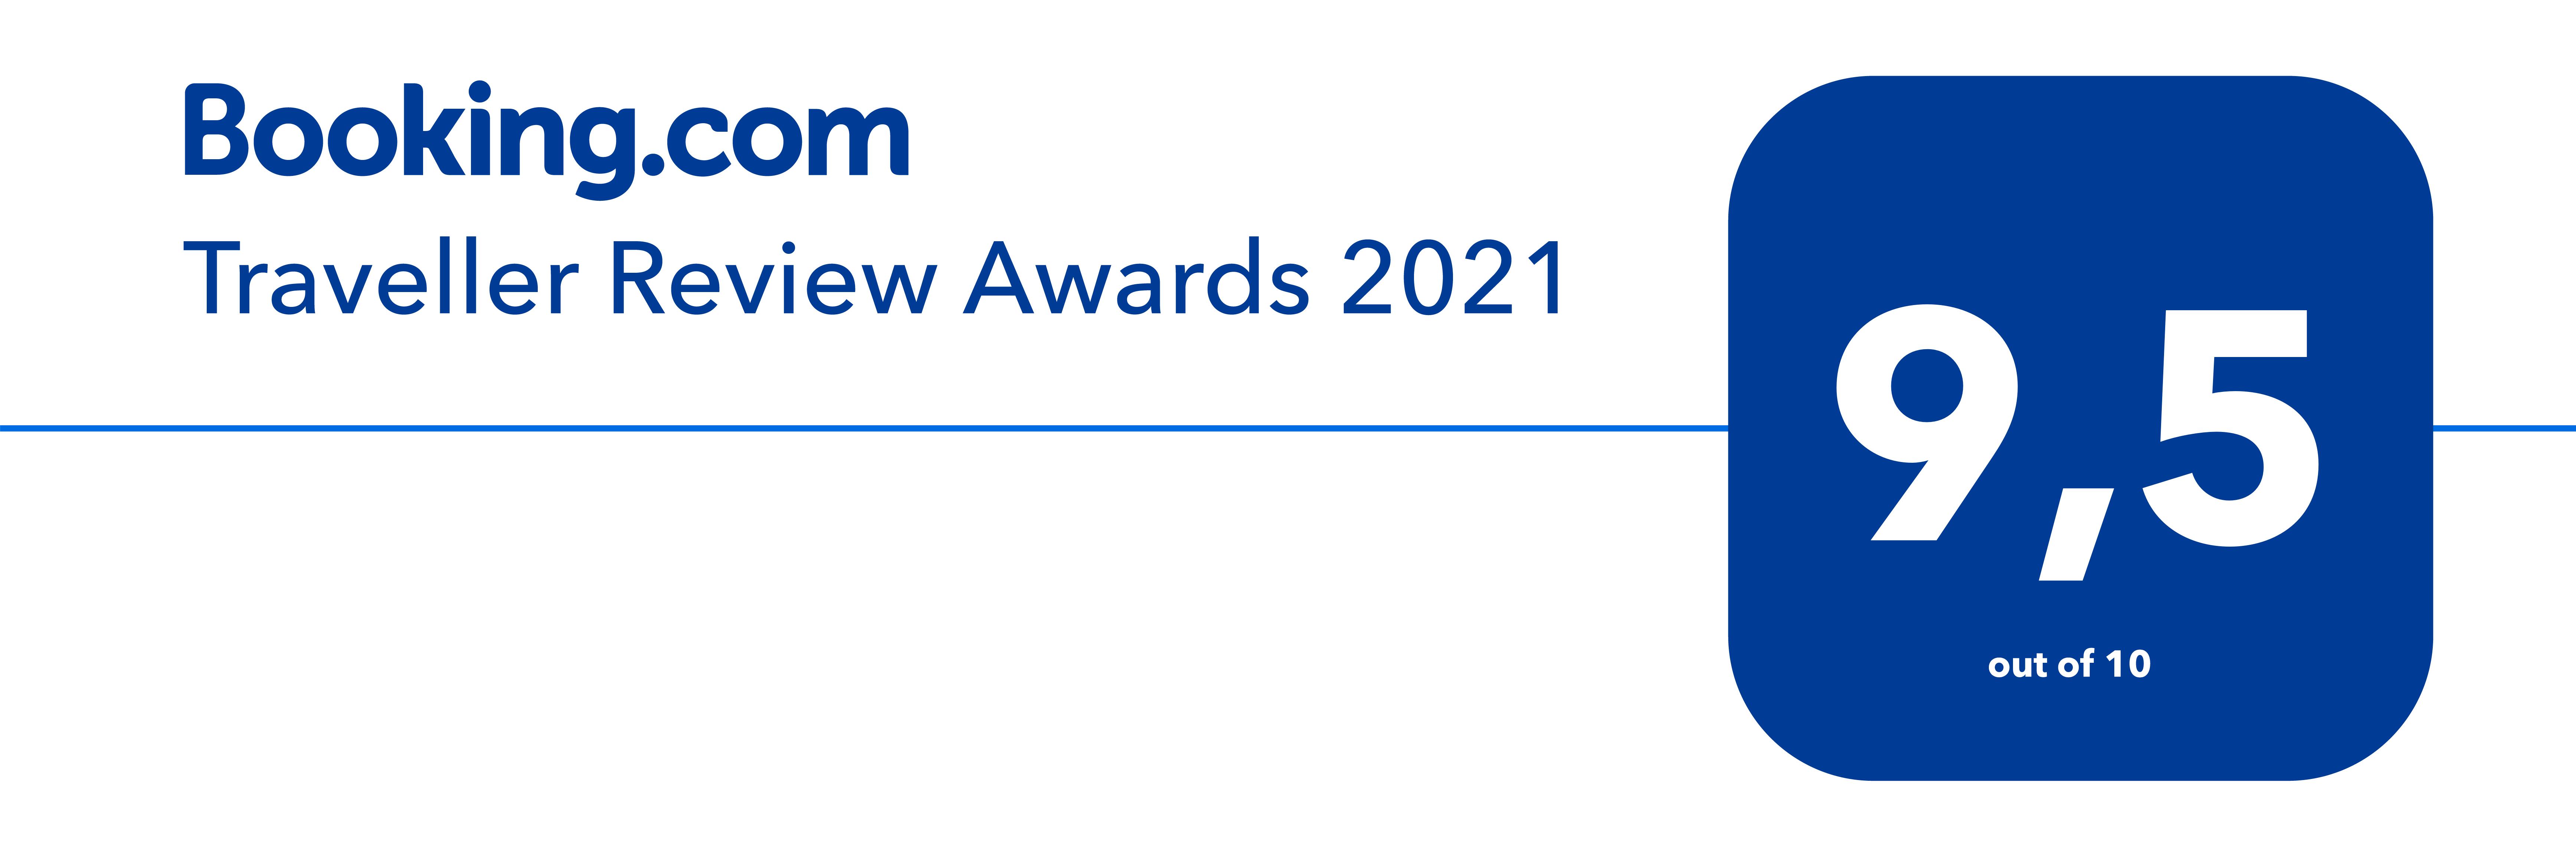 opinia booking 2021 topolej